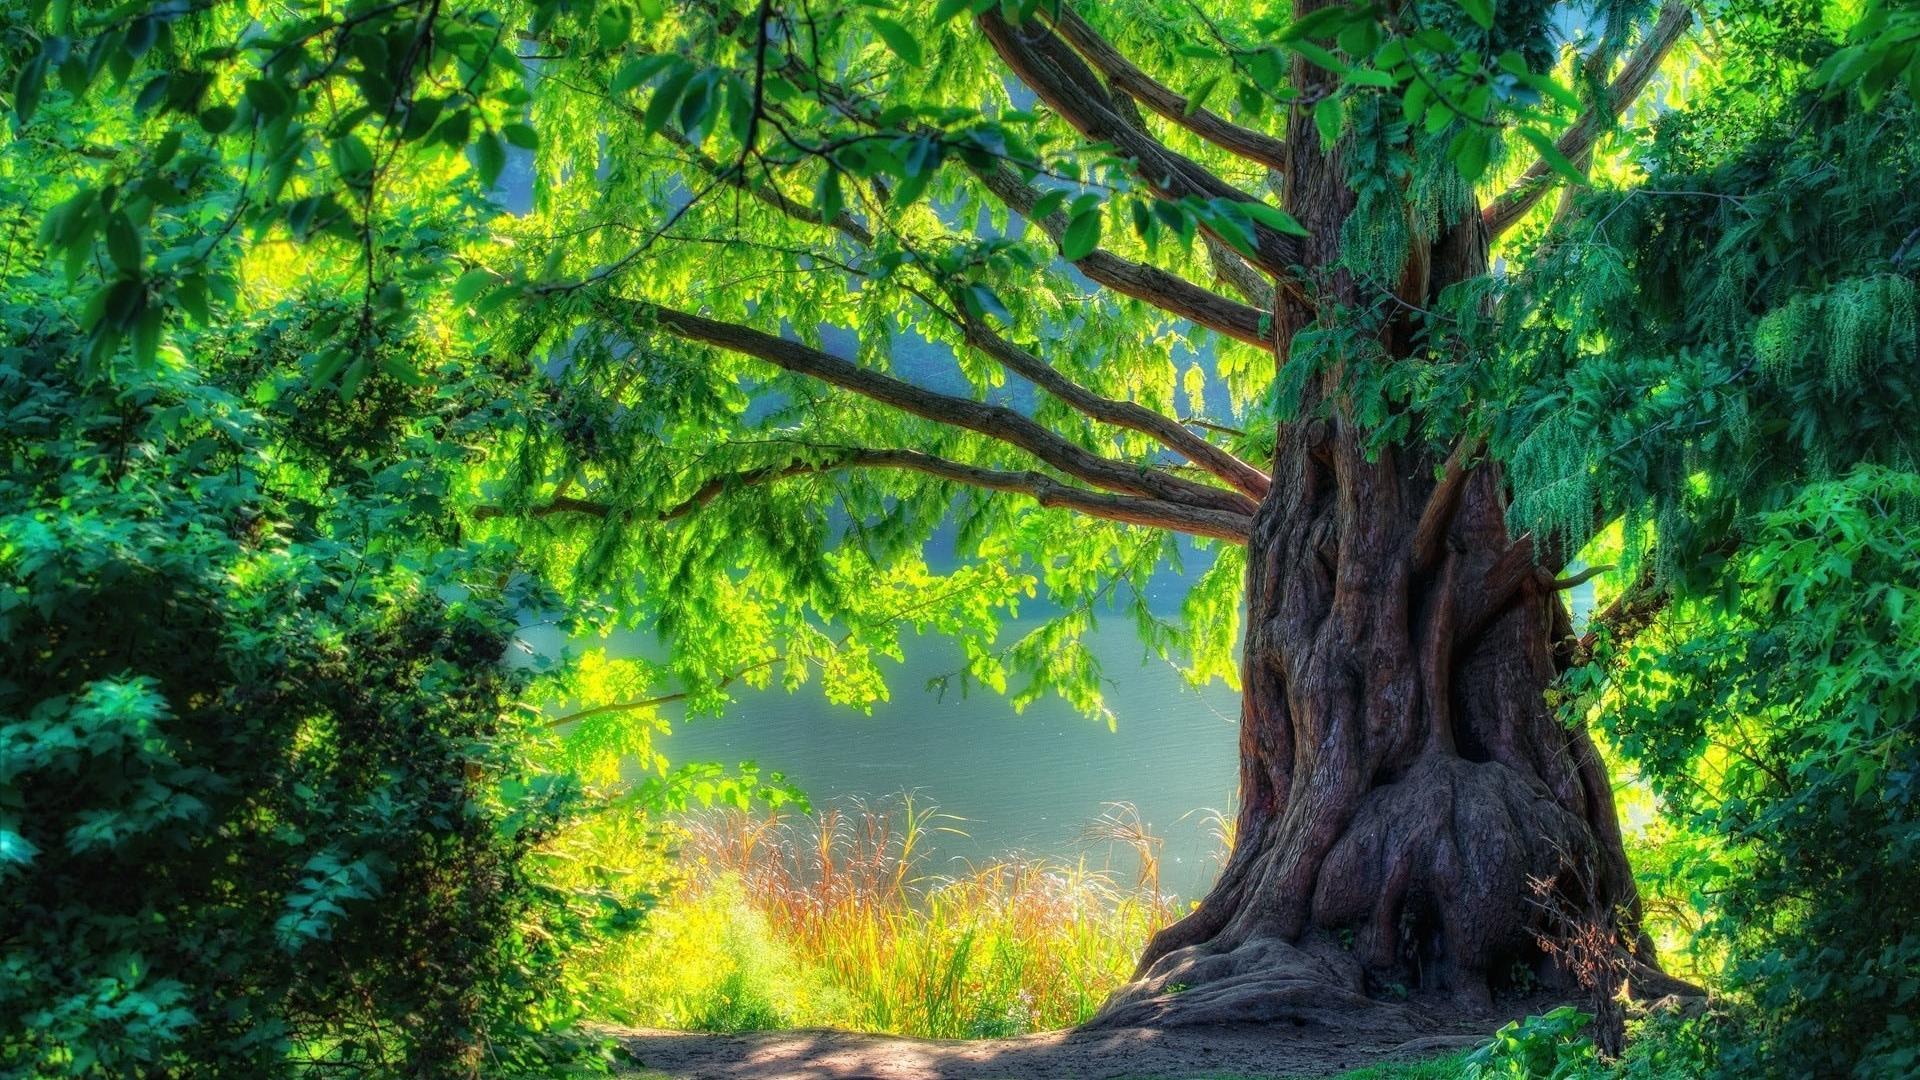 Beautiful-Nature-Images-HD-Wallpaper